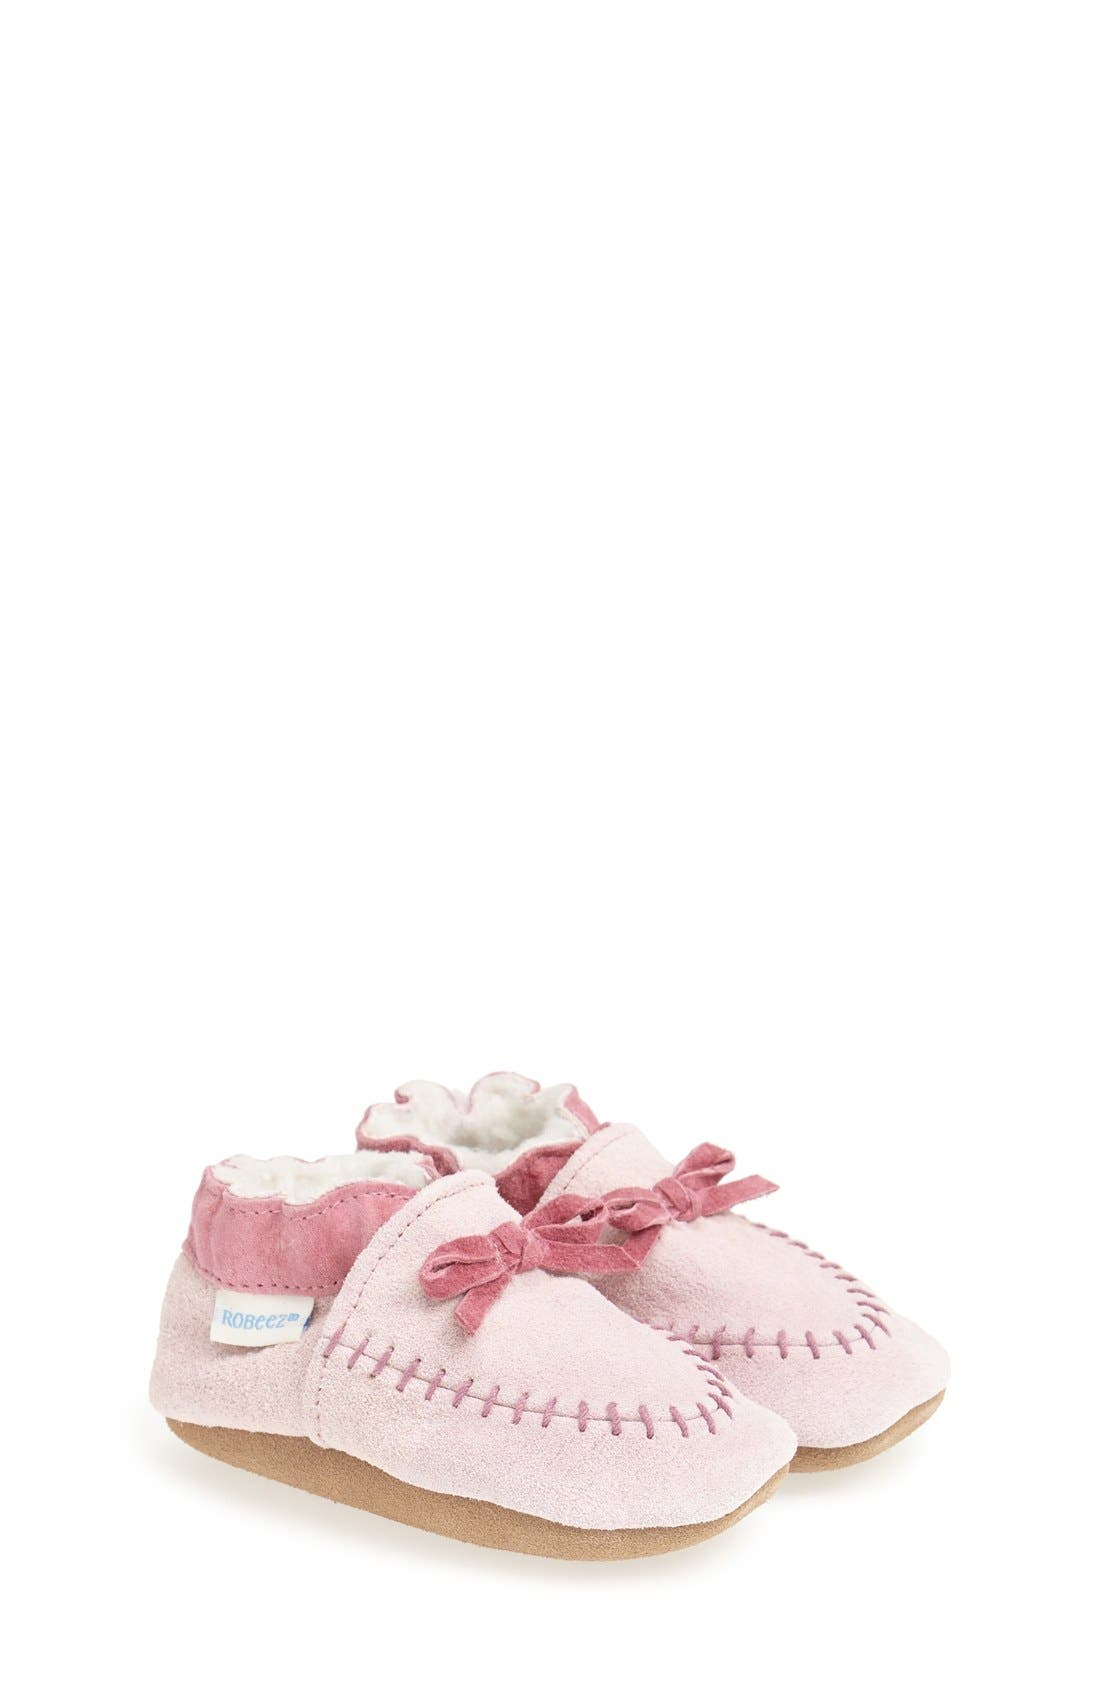 Alternate Image 1 Selected - Robeez® Cozy Moccasin Crib Shoe (Baby & Walker)